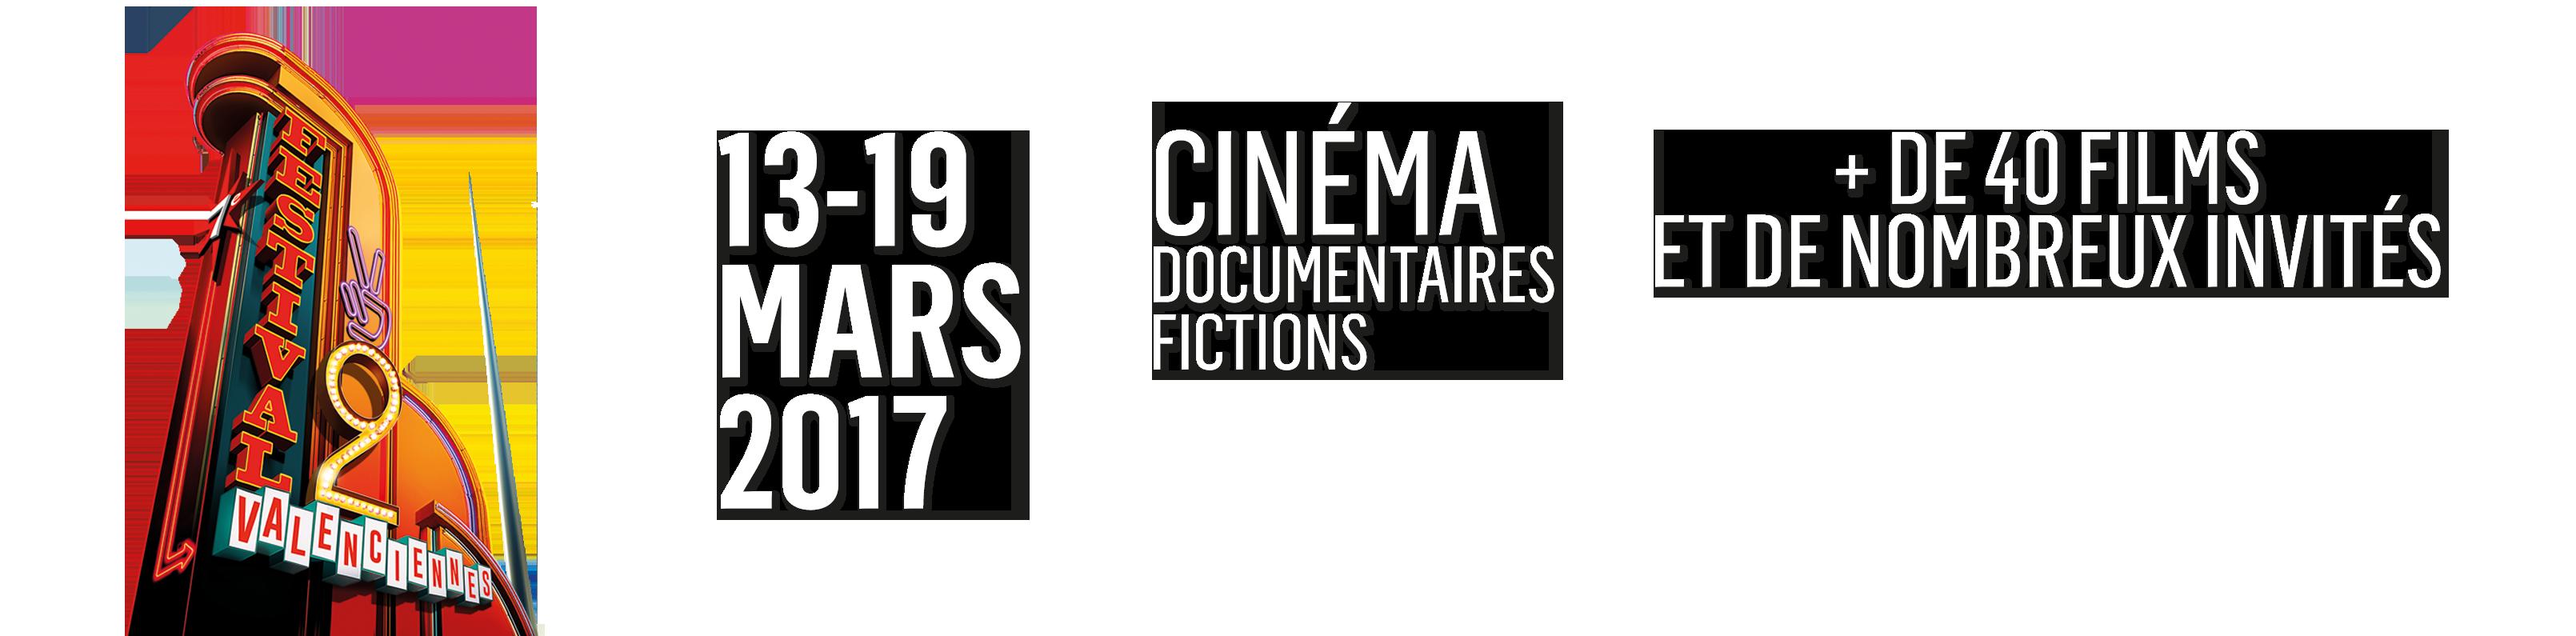 7ème festival de cinéma de Valenciennes, 13-19 mars 2017